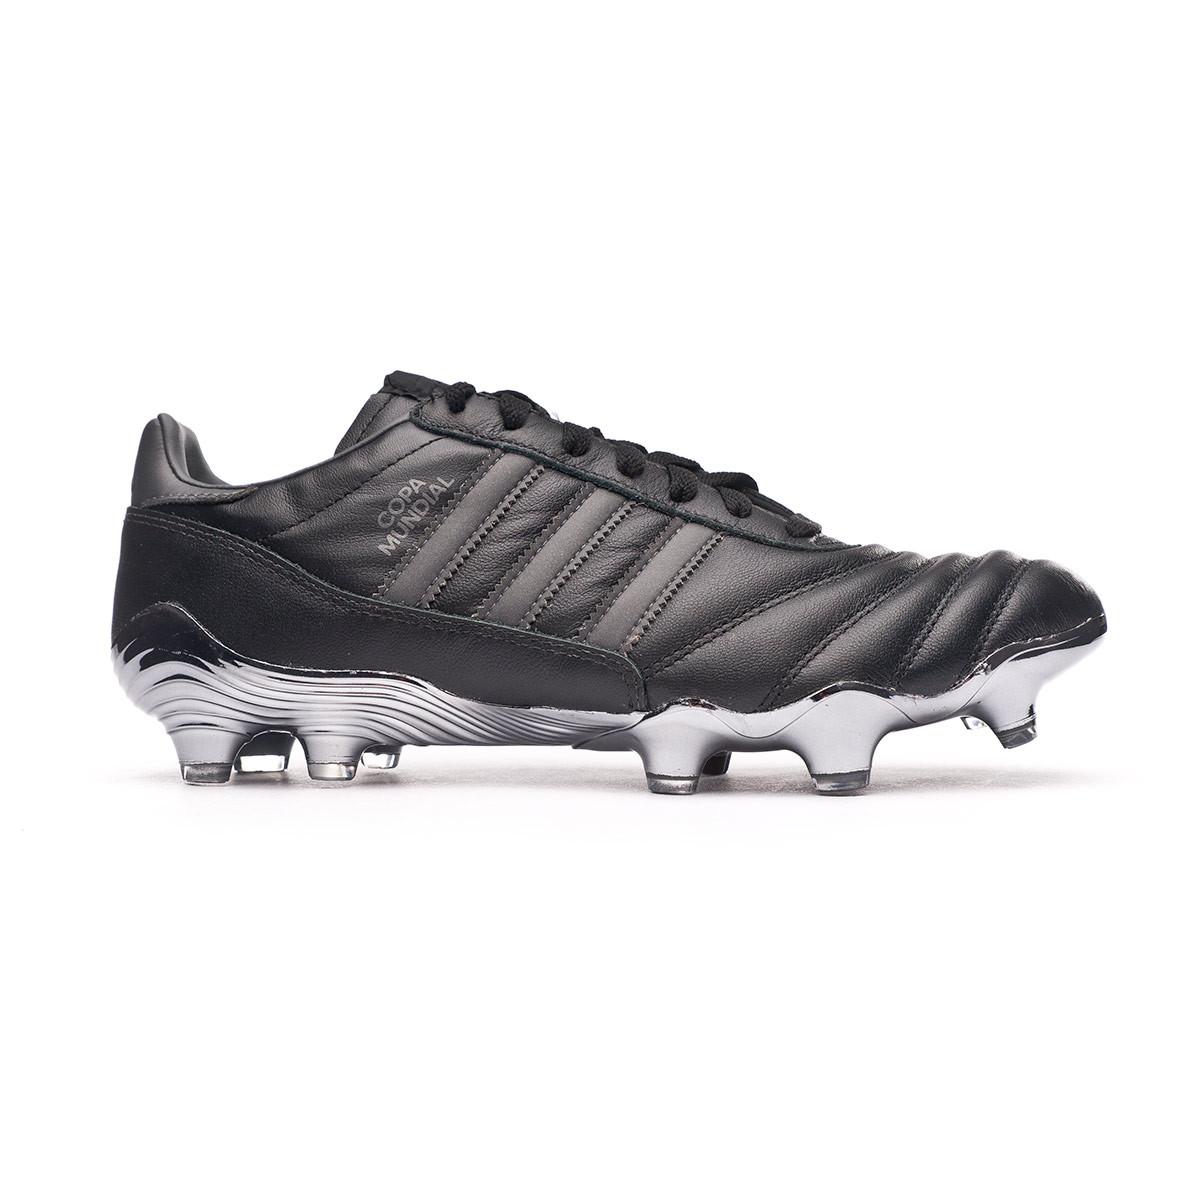 Chaussure de foot adidas Copa Mundial FG Black - Fútbol Emotion